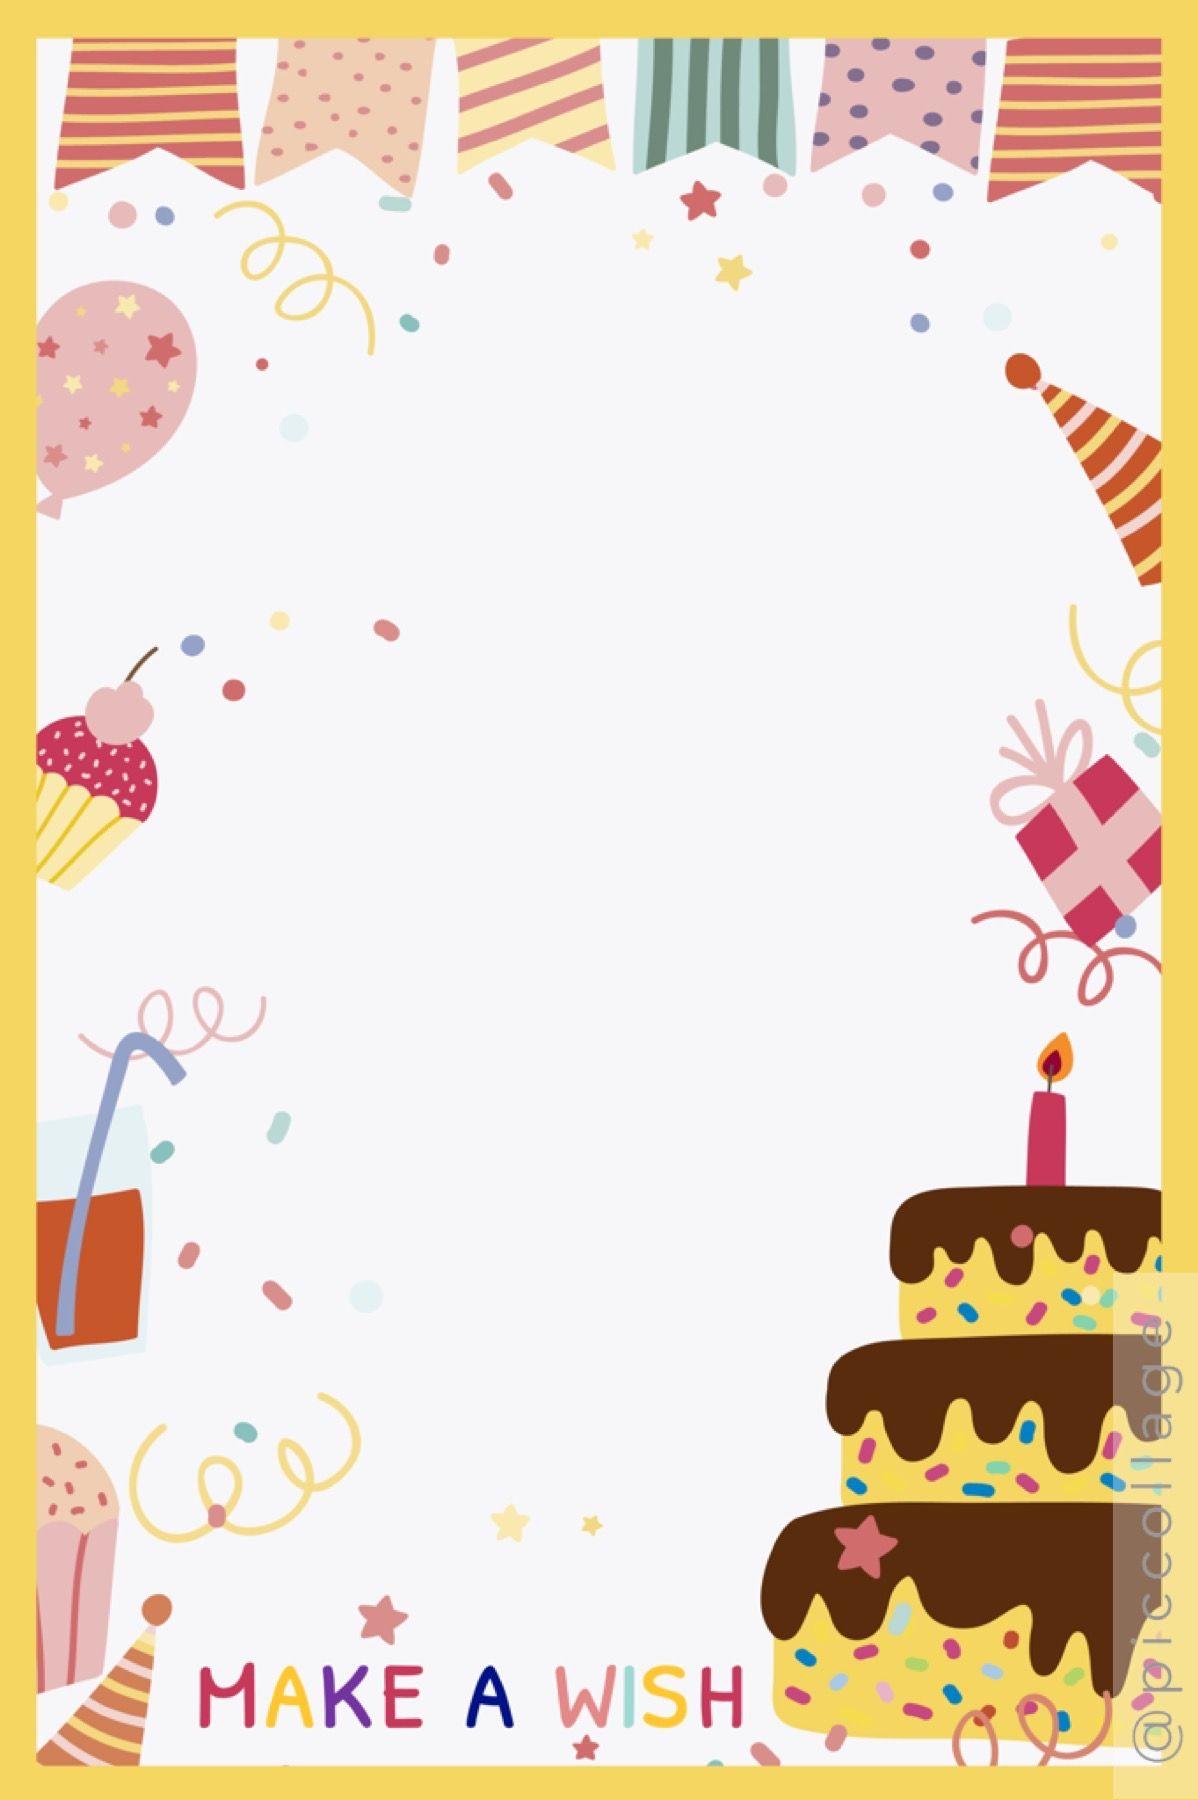 Free Digital Birthday Card Diy Birthday Card In 2021 Birthday Card Template Digital Birthday Cards Birthday Cards